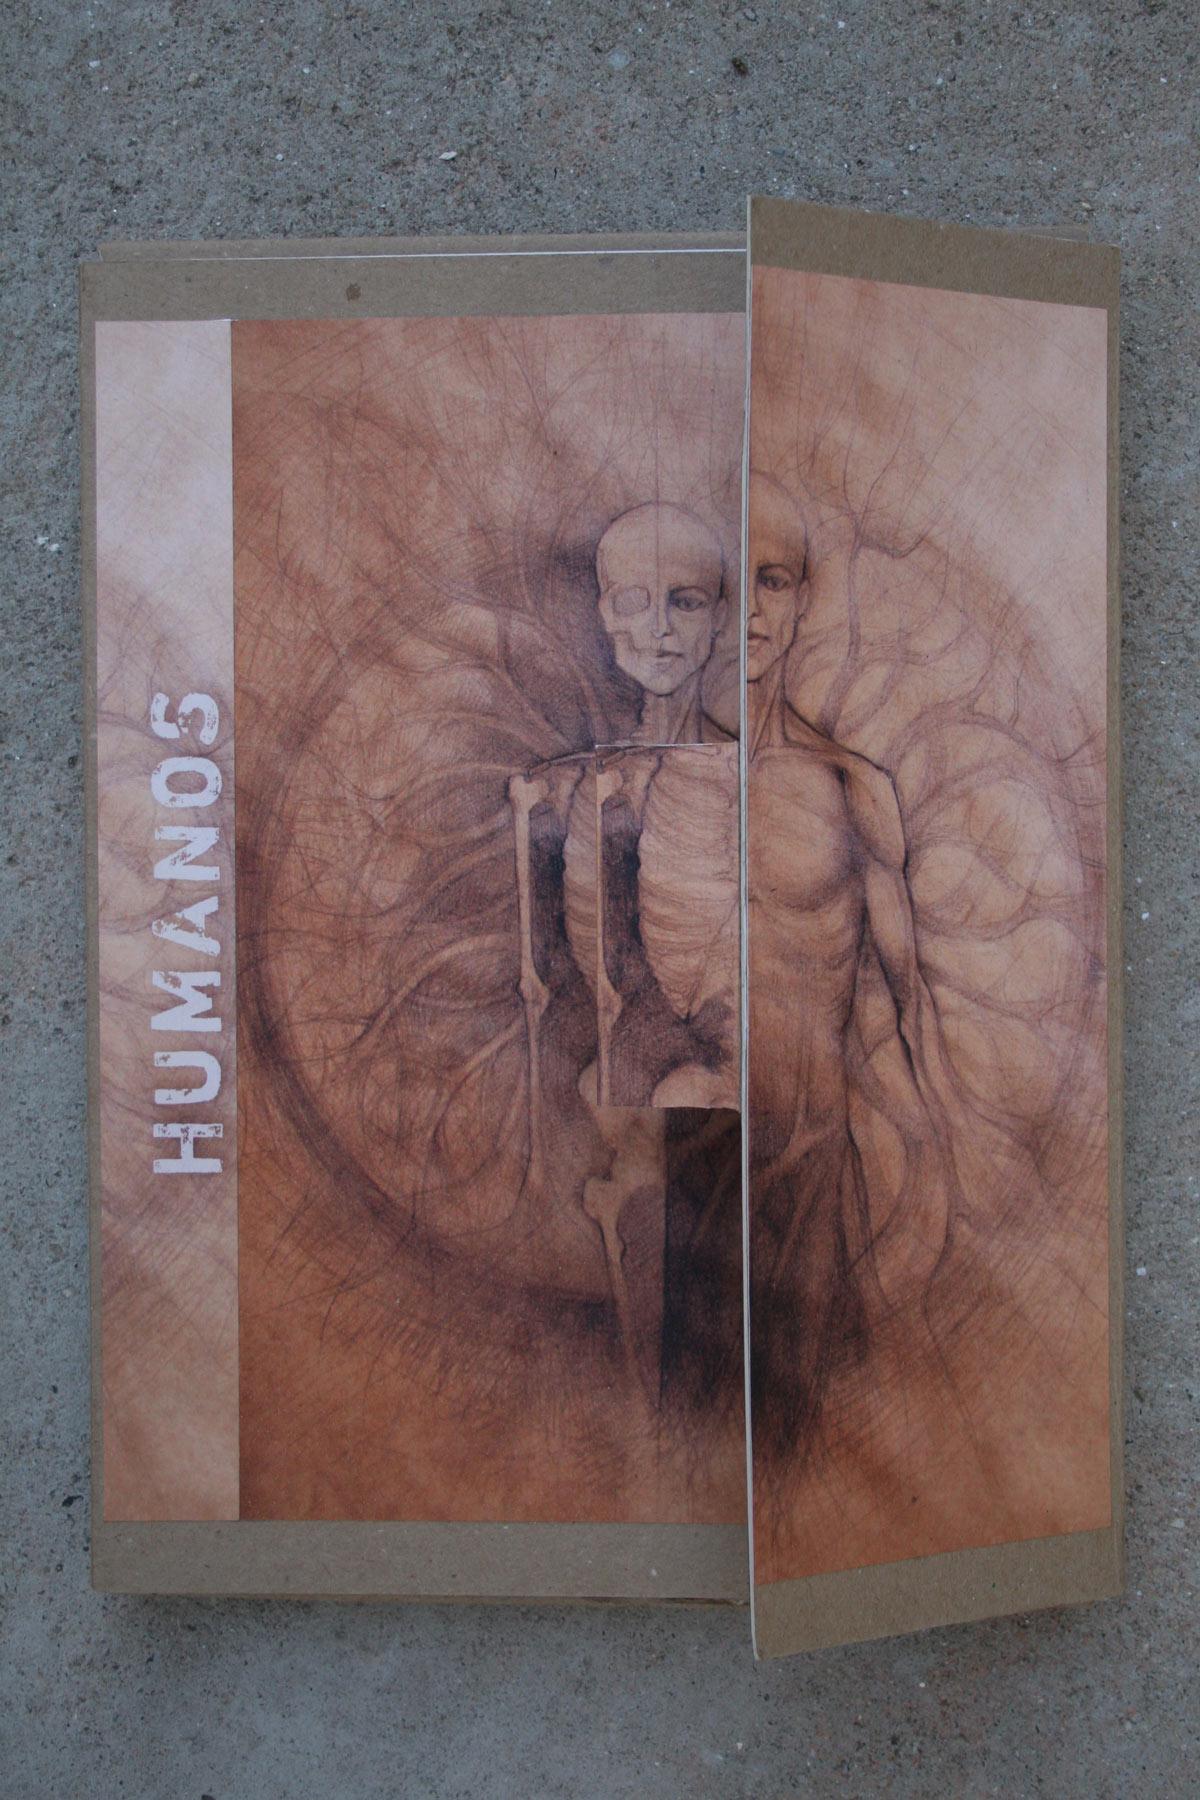 humanos-box-05-1200px.jpg